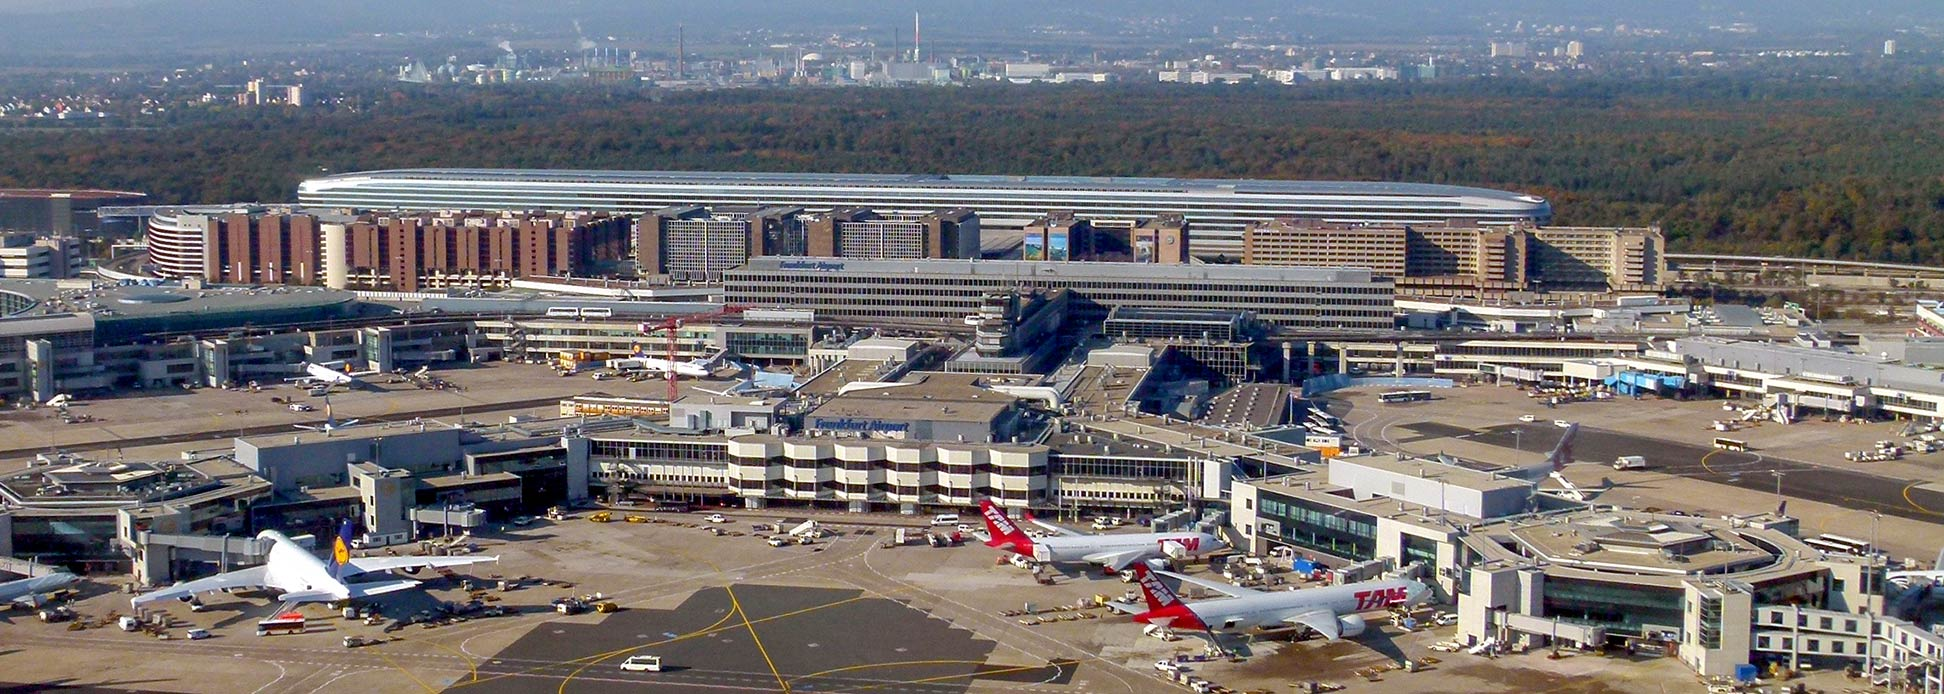 Airports around the World - IATA code: F - Nations Online